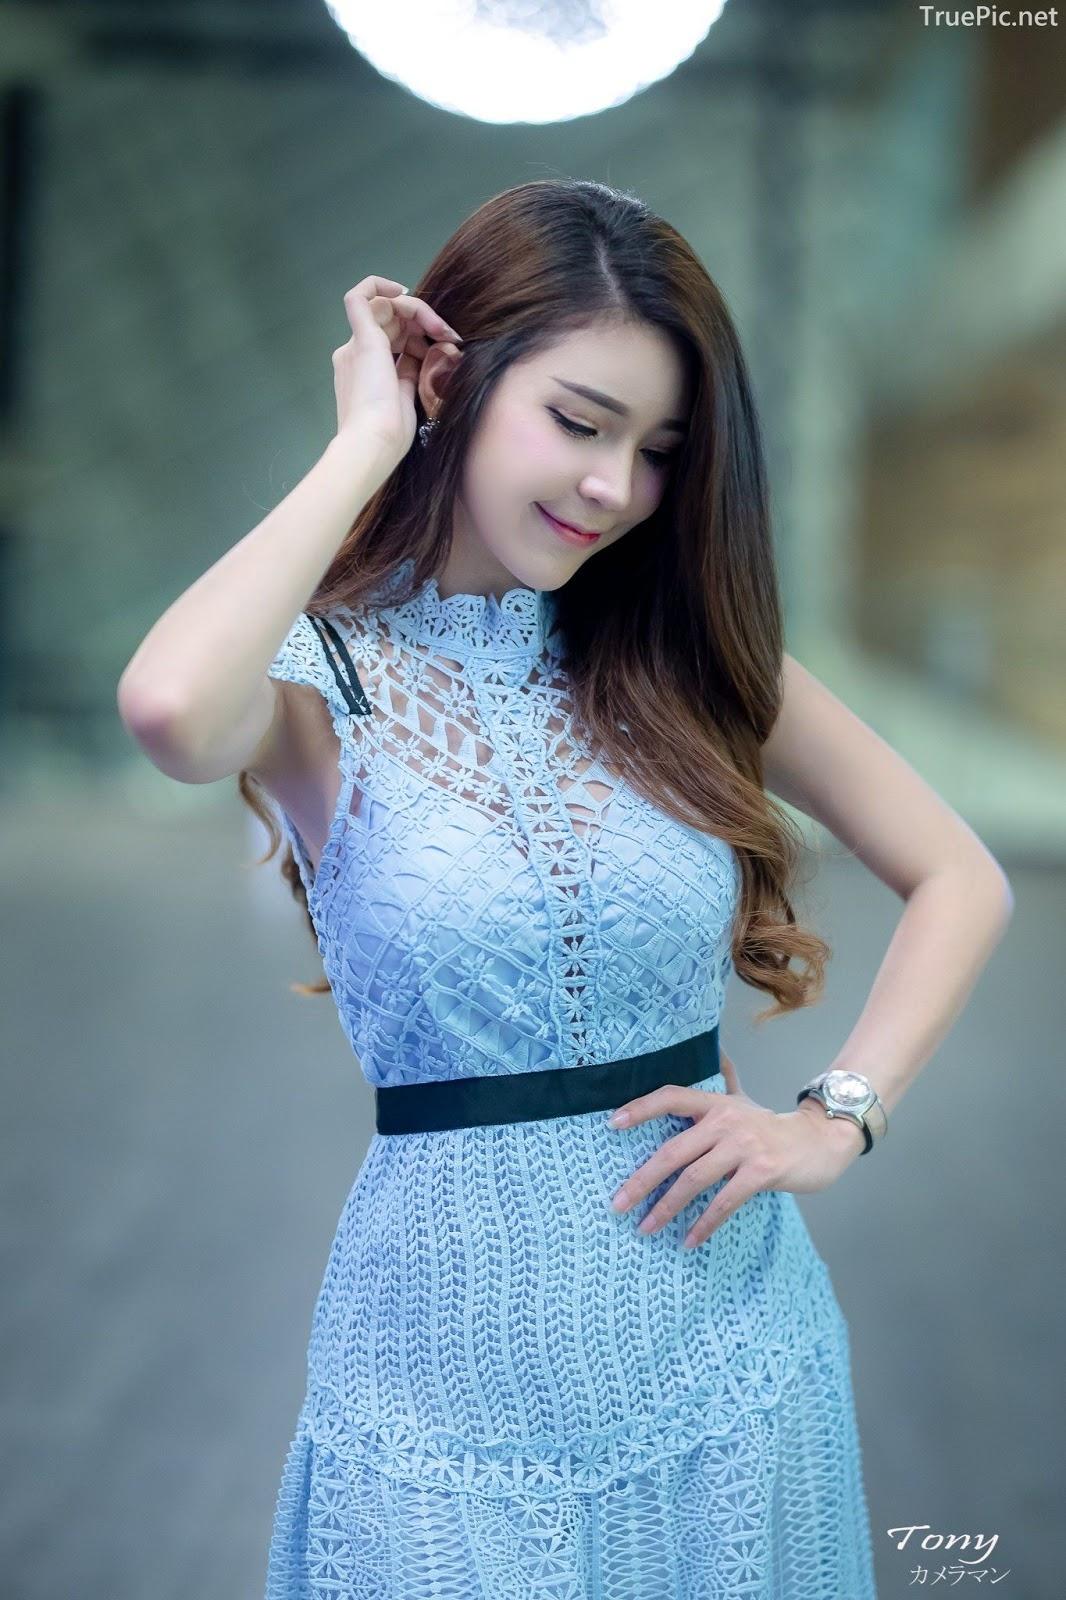 Thailand hot model – Janet Kanokwan Saesim – Sexy vs Cute and Bra vs Long Dress - Picture 1